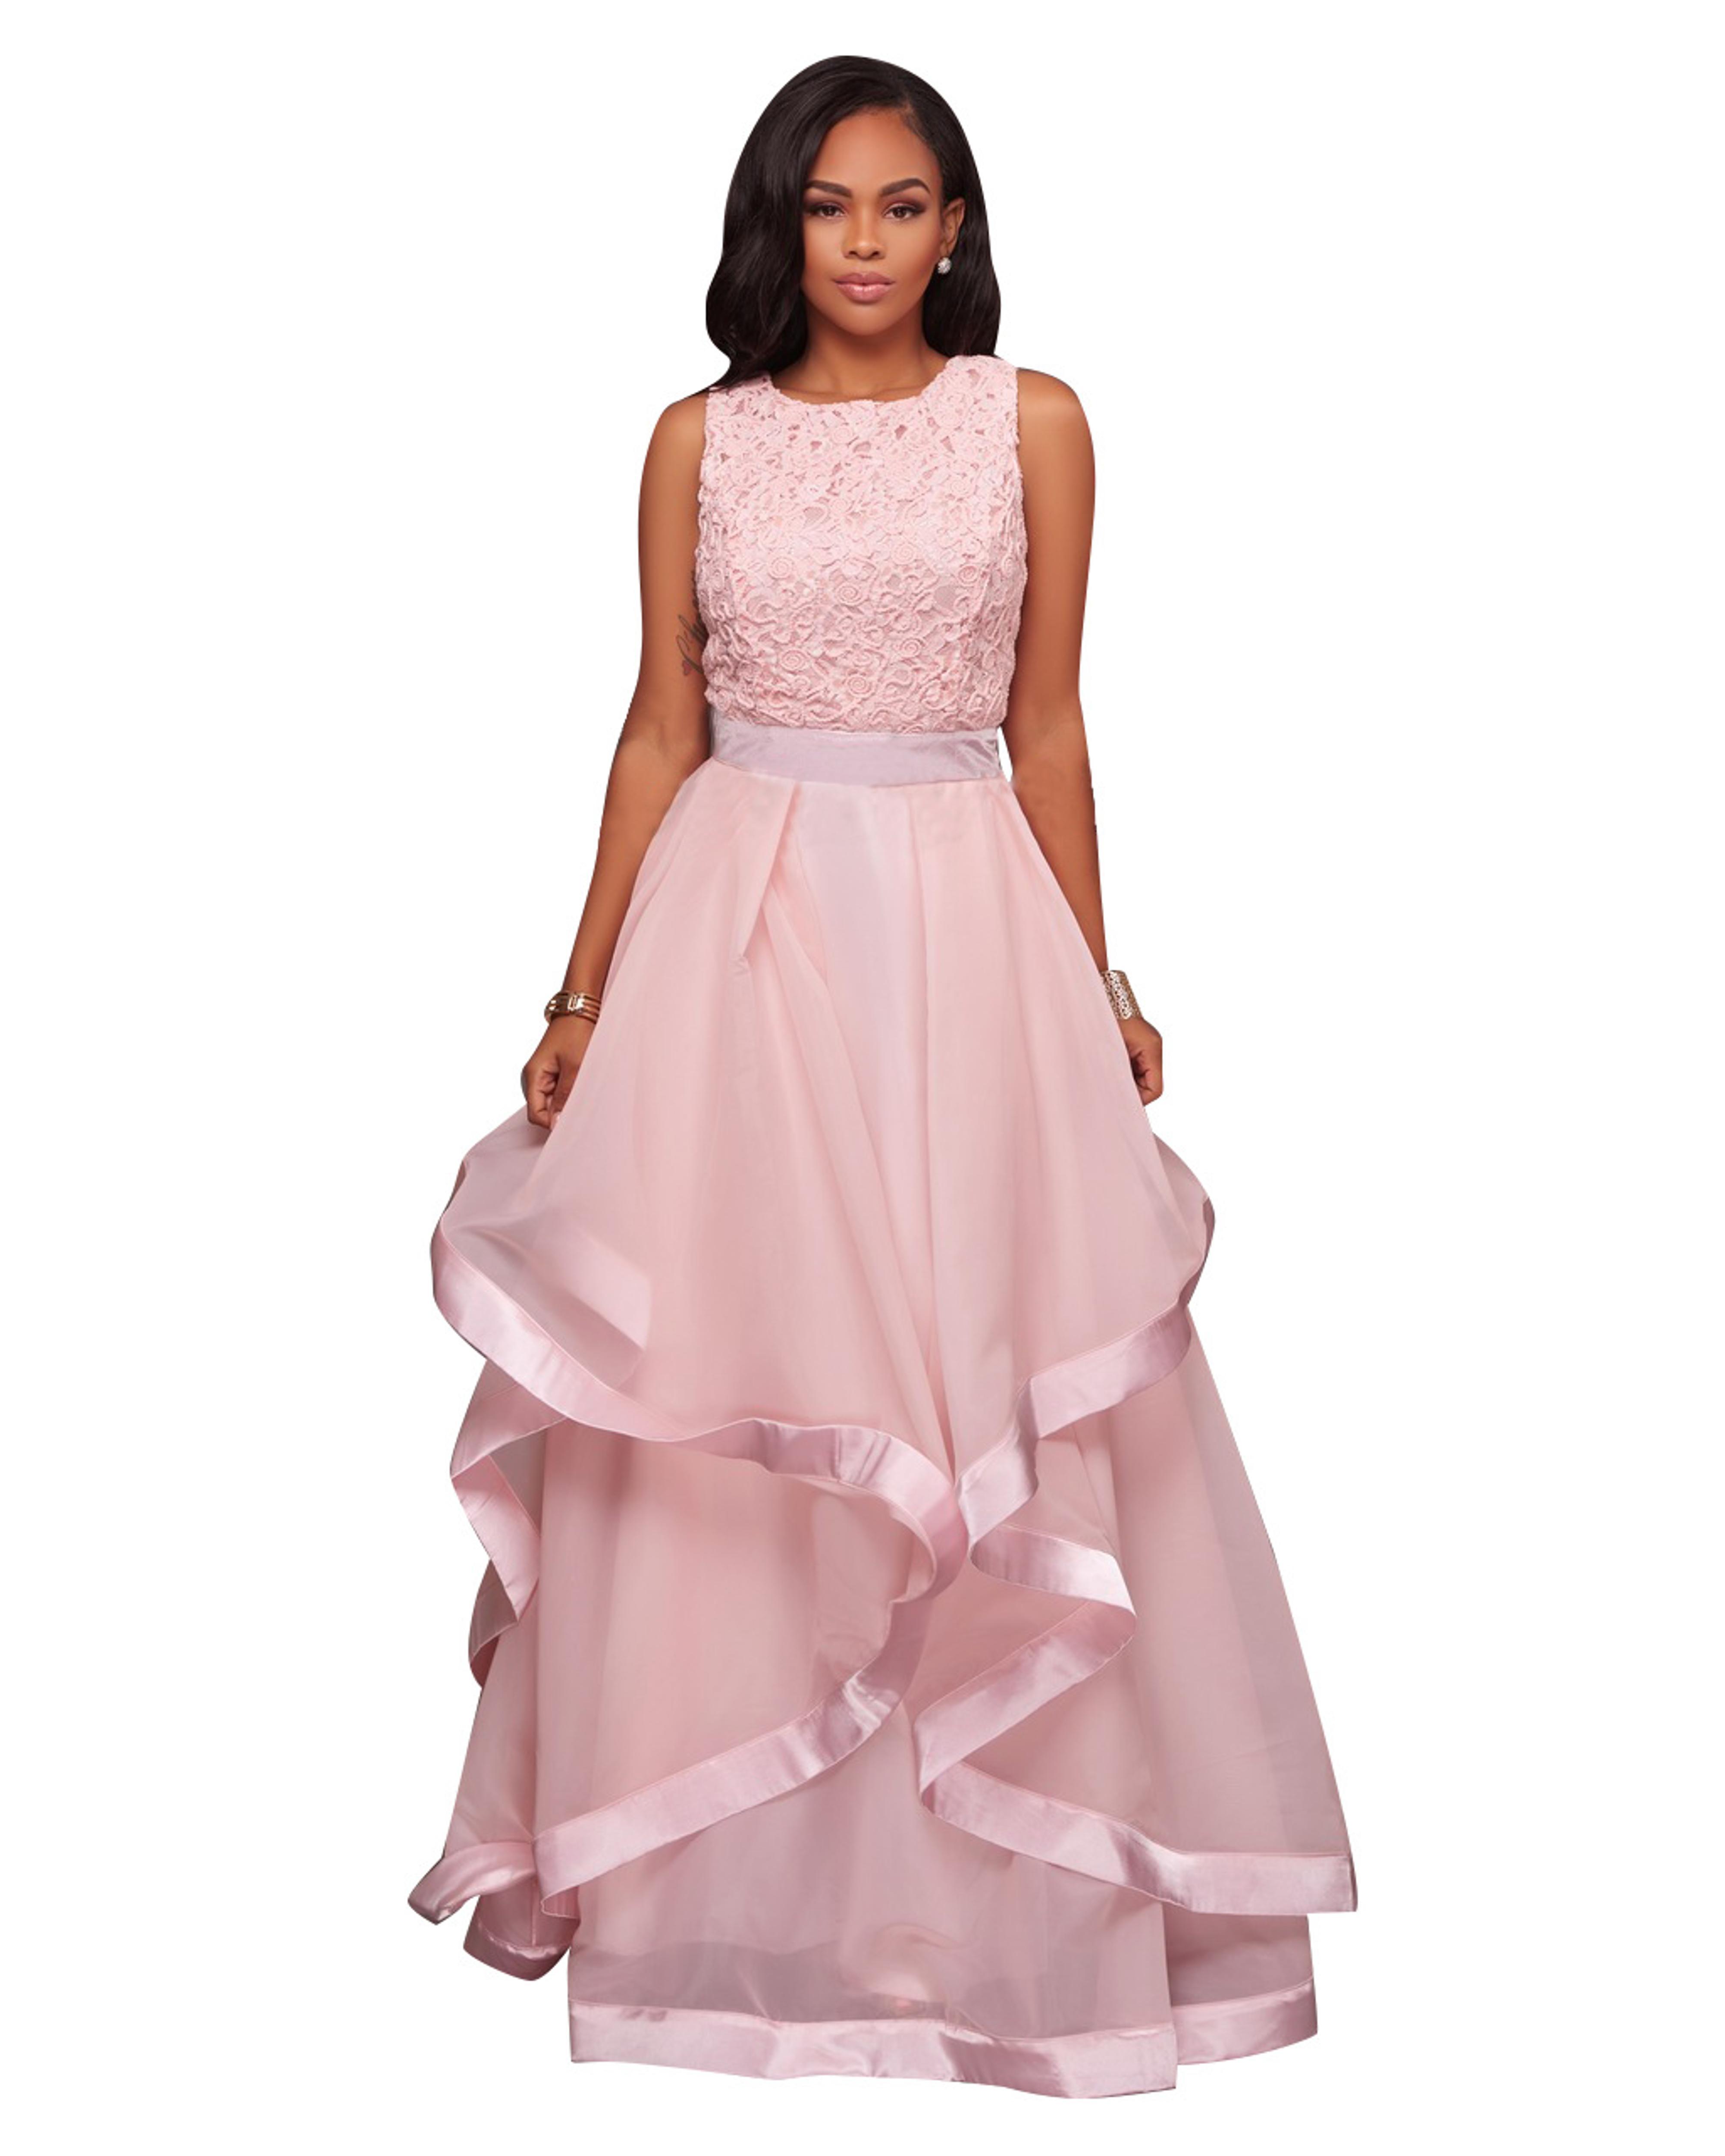 2019 Indian Dress Sari Women Indian Saree 2017 Cotton Polyester Women Hot  New Fashion Elegant Dress Sexy Pure Wedding From Alluring, $46.3